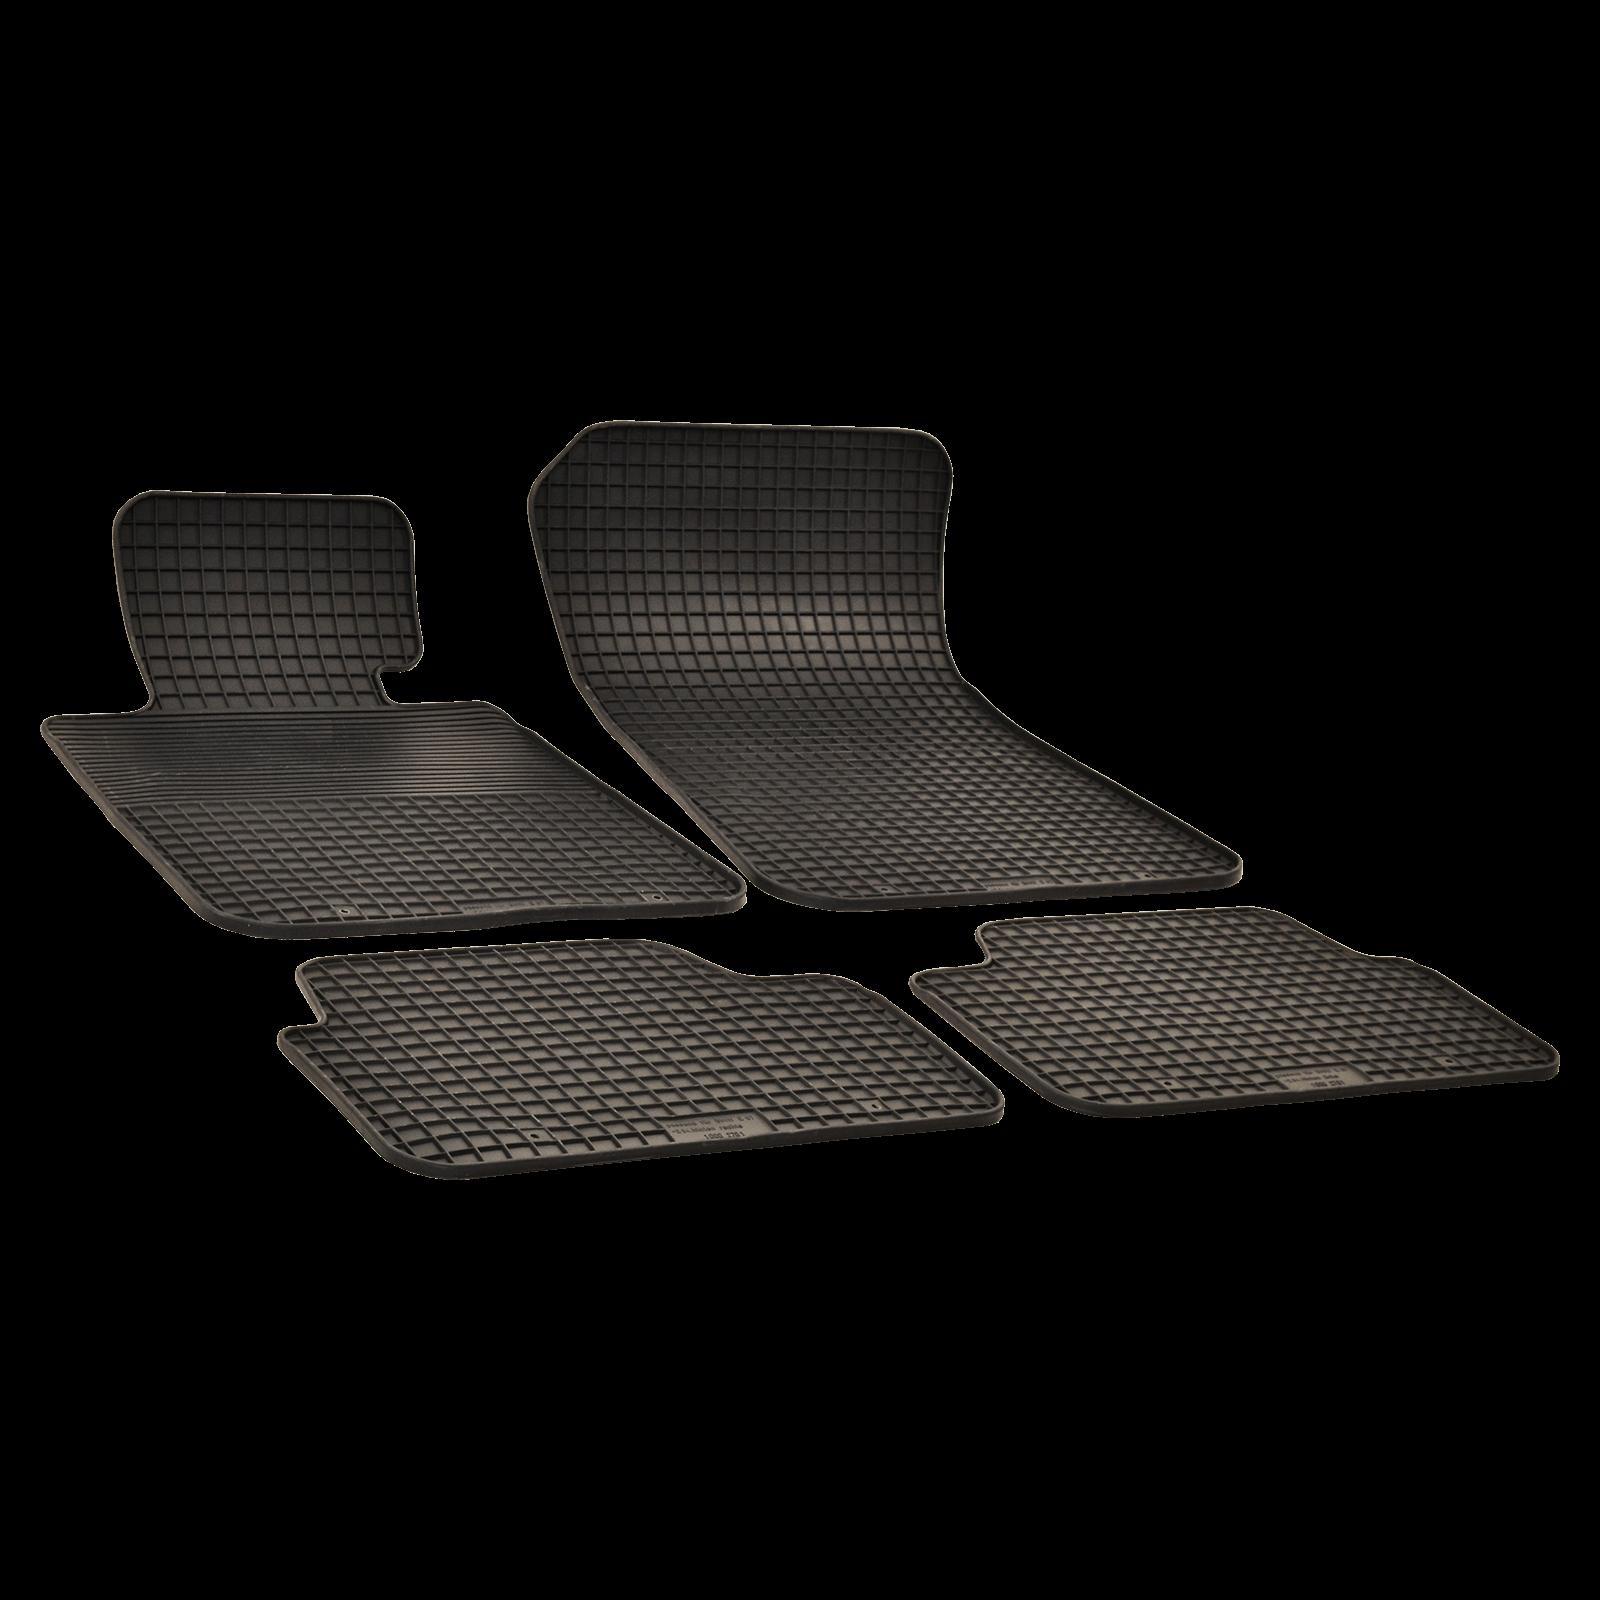 gummi fu matten schwarz f r bmw x1 bj. Black Bedroom Furniture Sets. Home Design Ideas